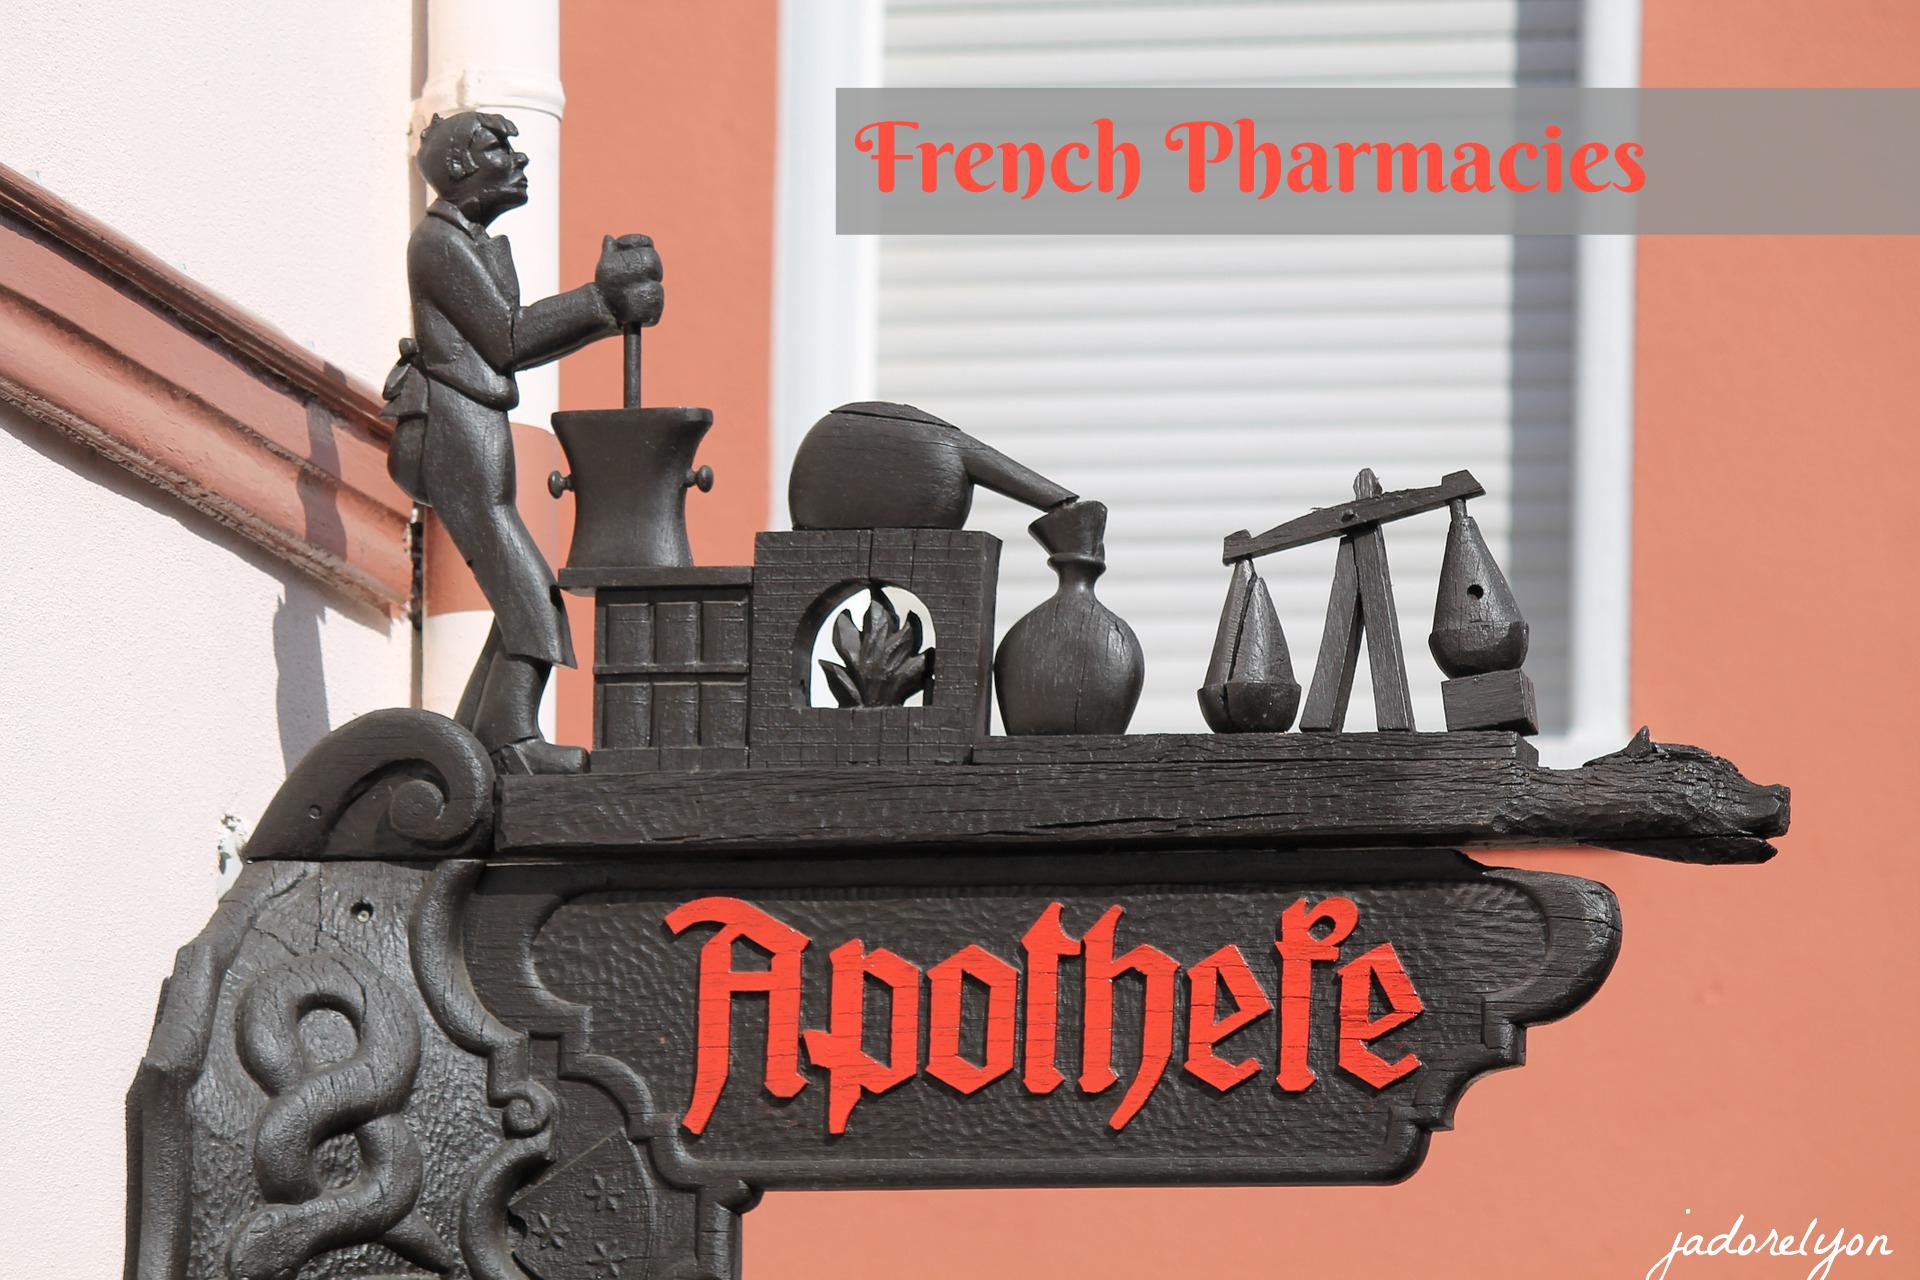 French pharmacies